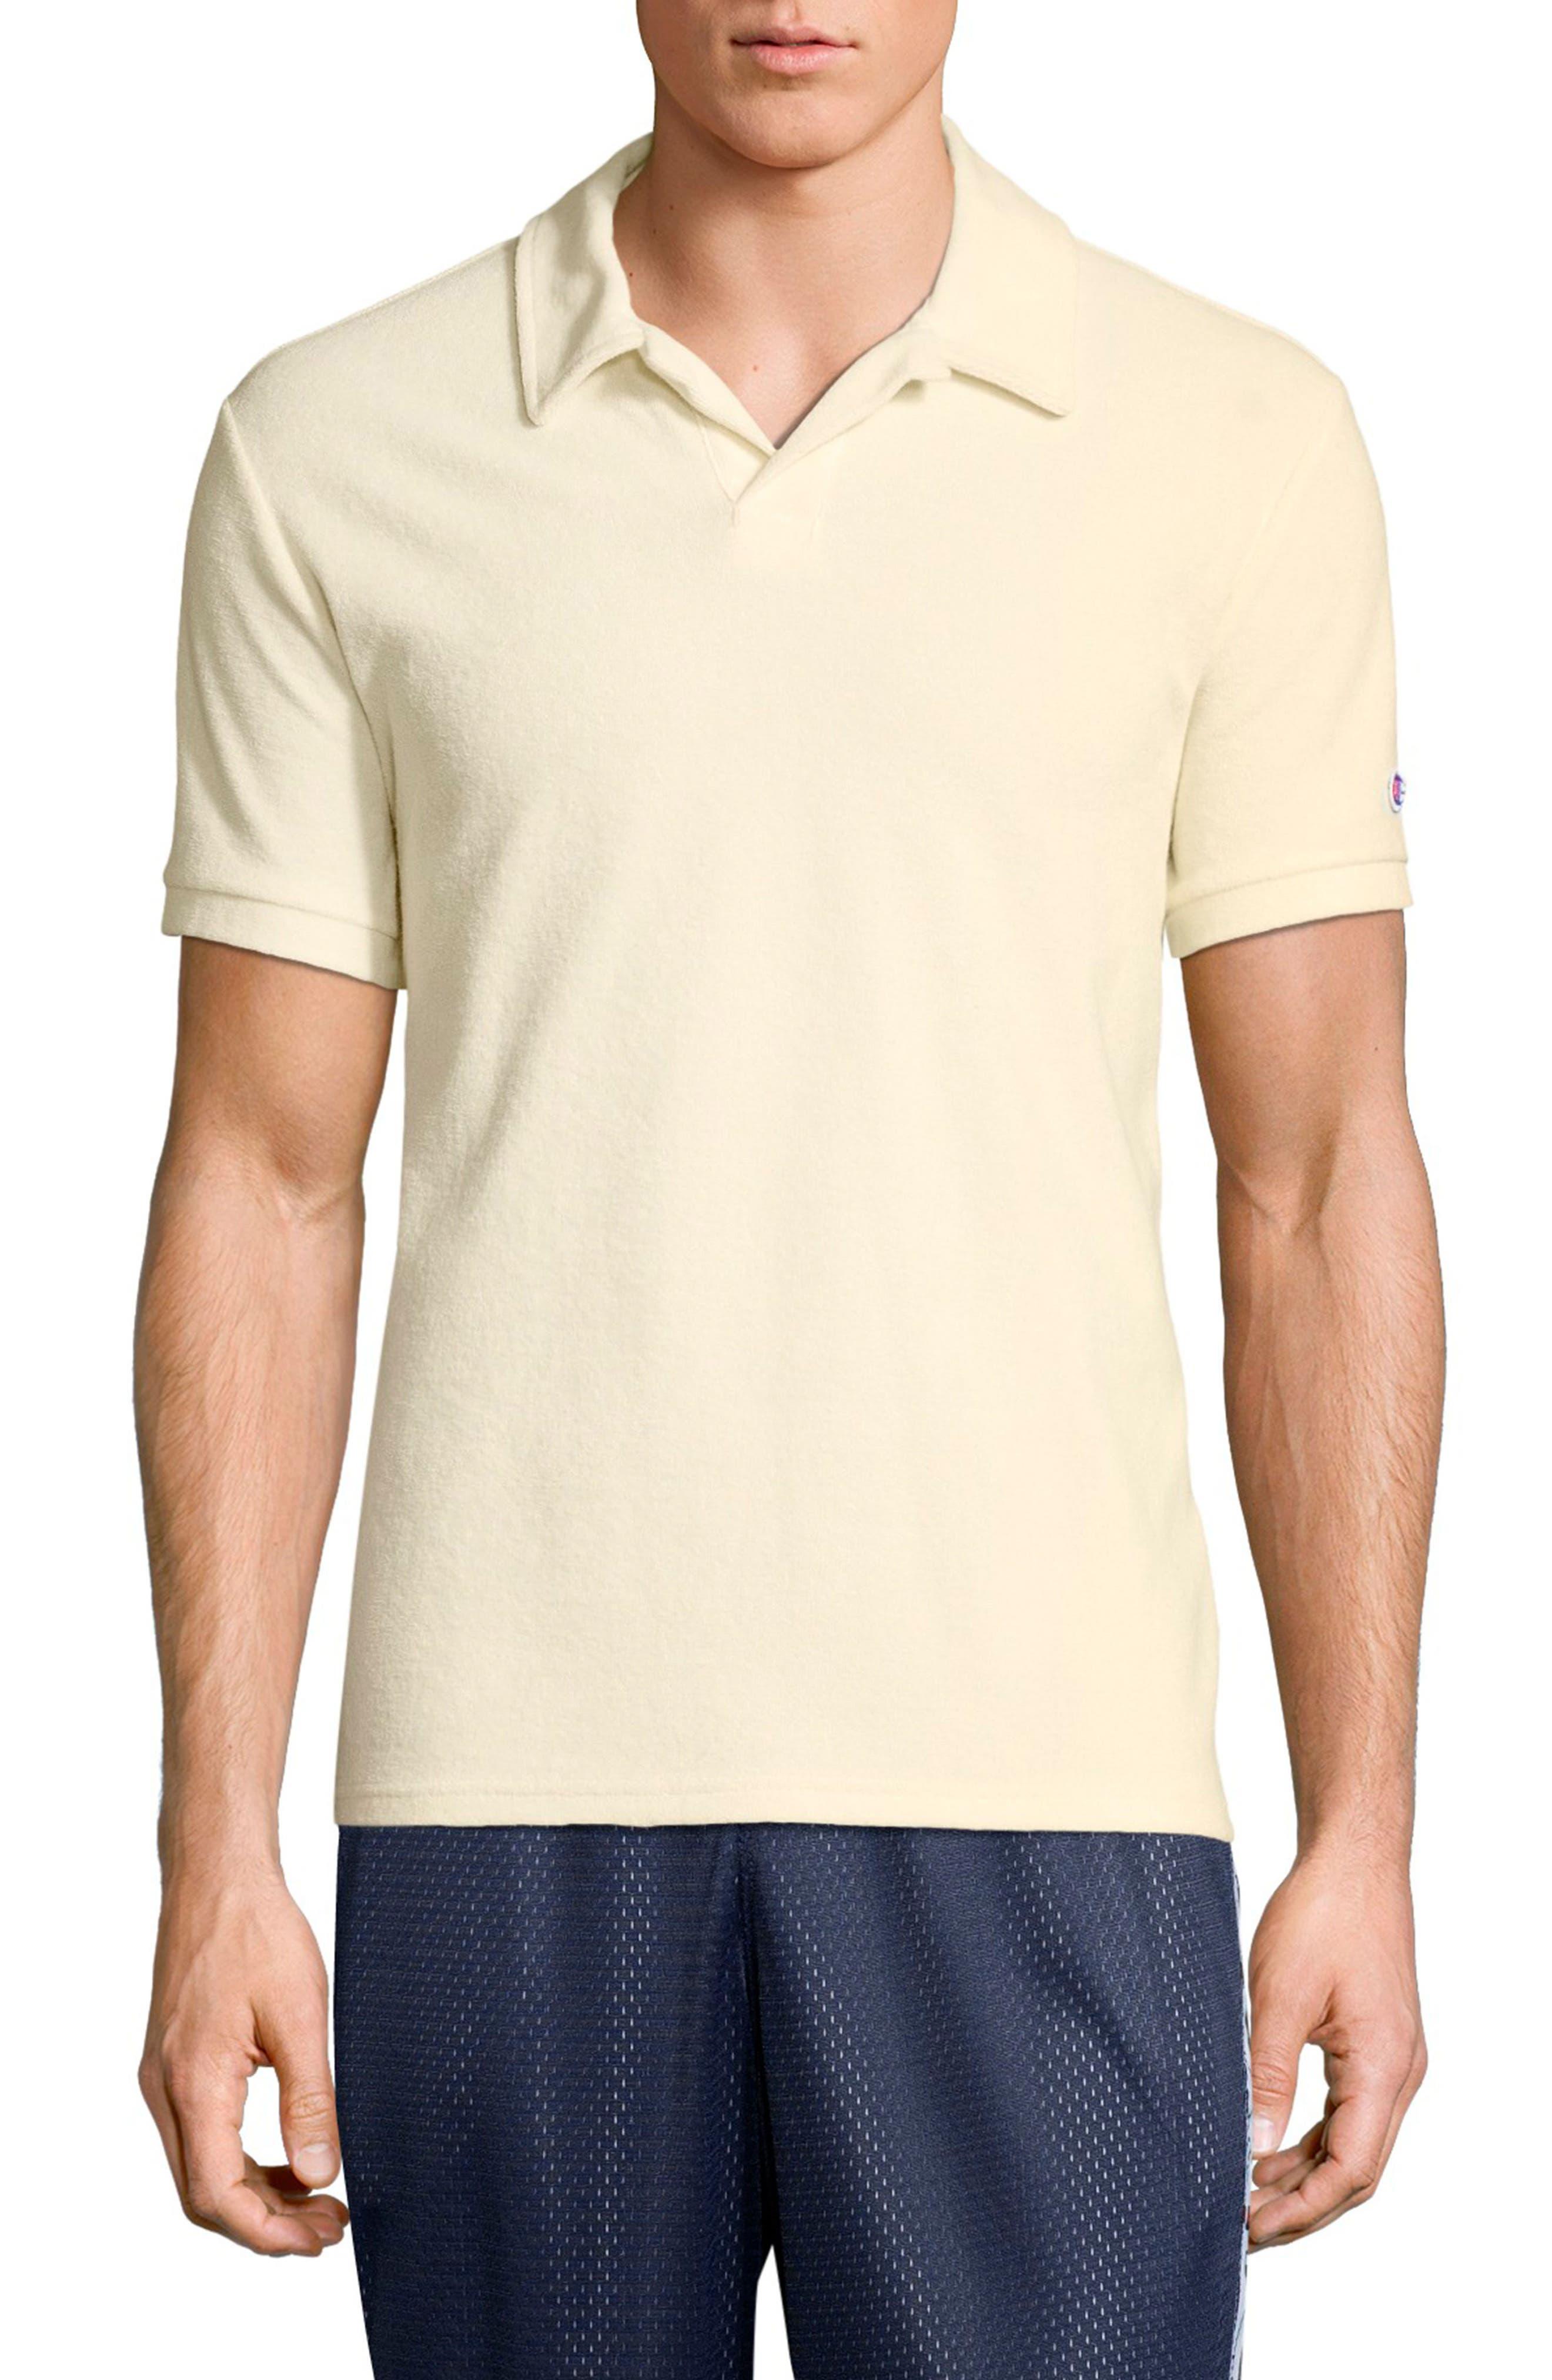 Sponge Terry Crewneck Sweatshirt,                             Main thumbnail 1, color,                             WHITE ALABASTER